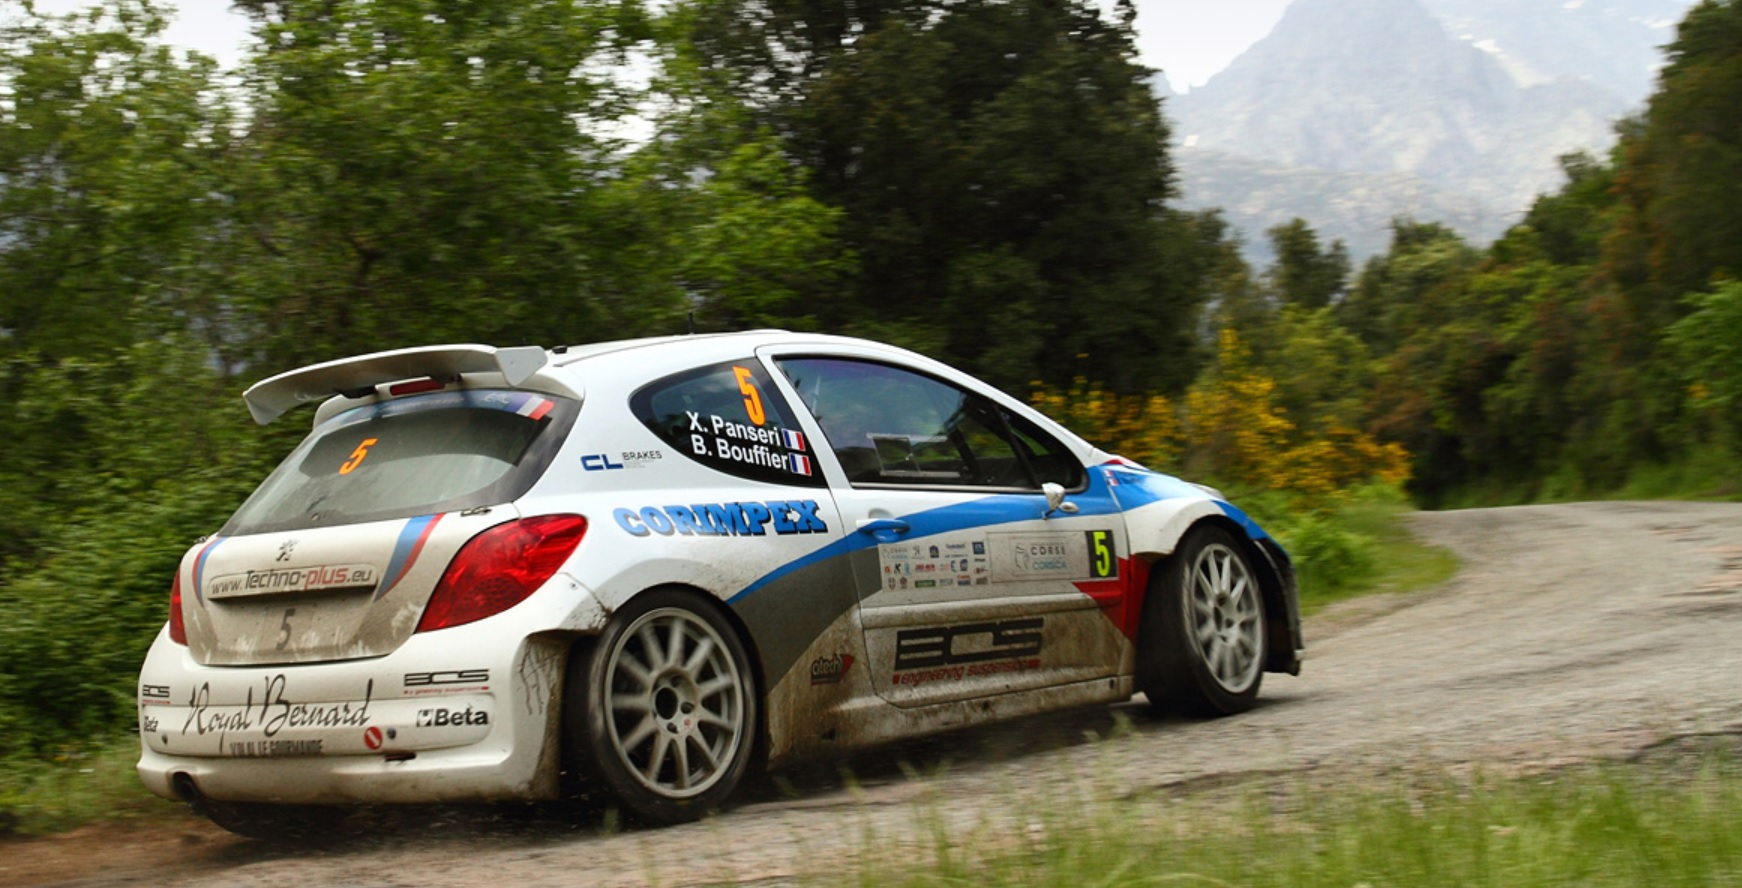 Bouffier-Panseri .Photo Rallye-Mania-cz